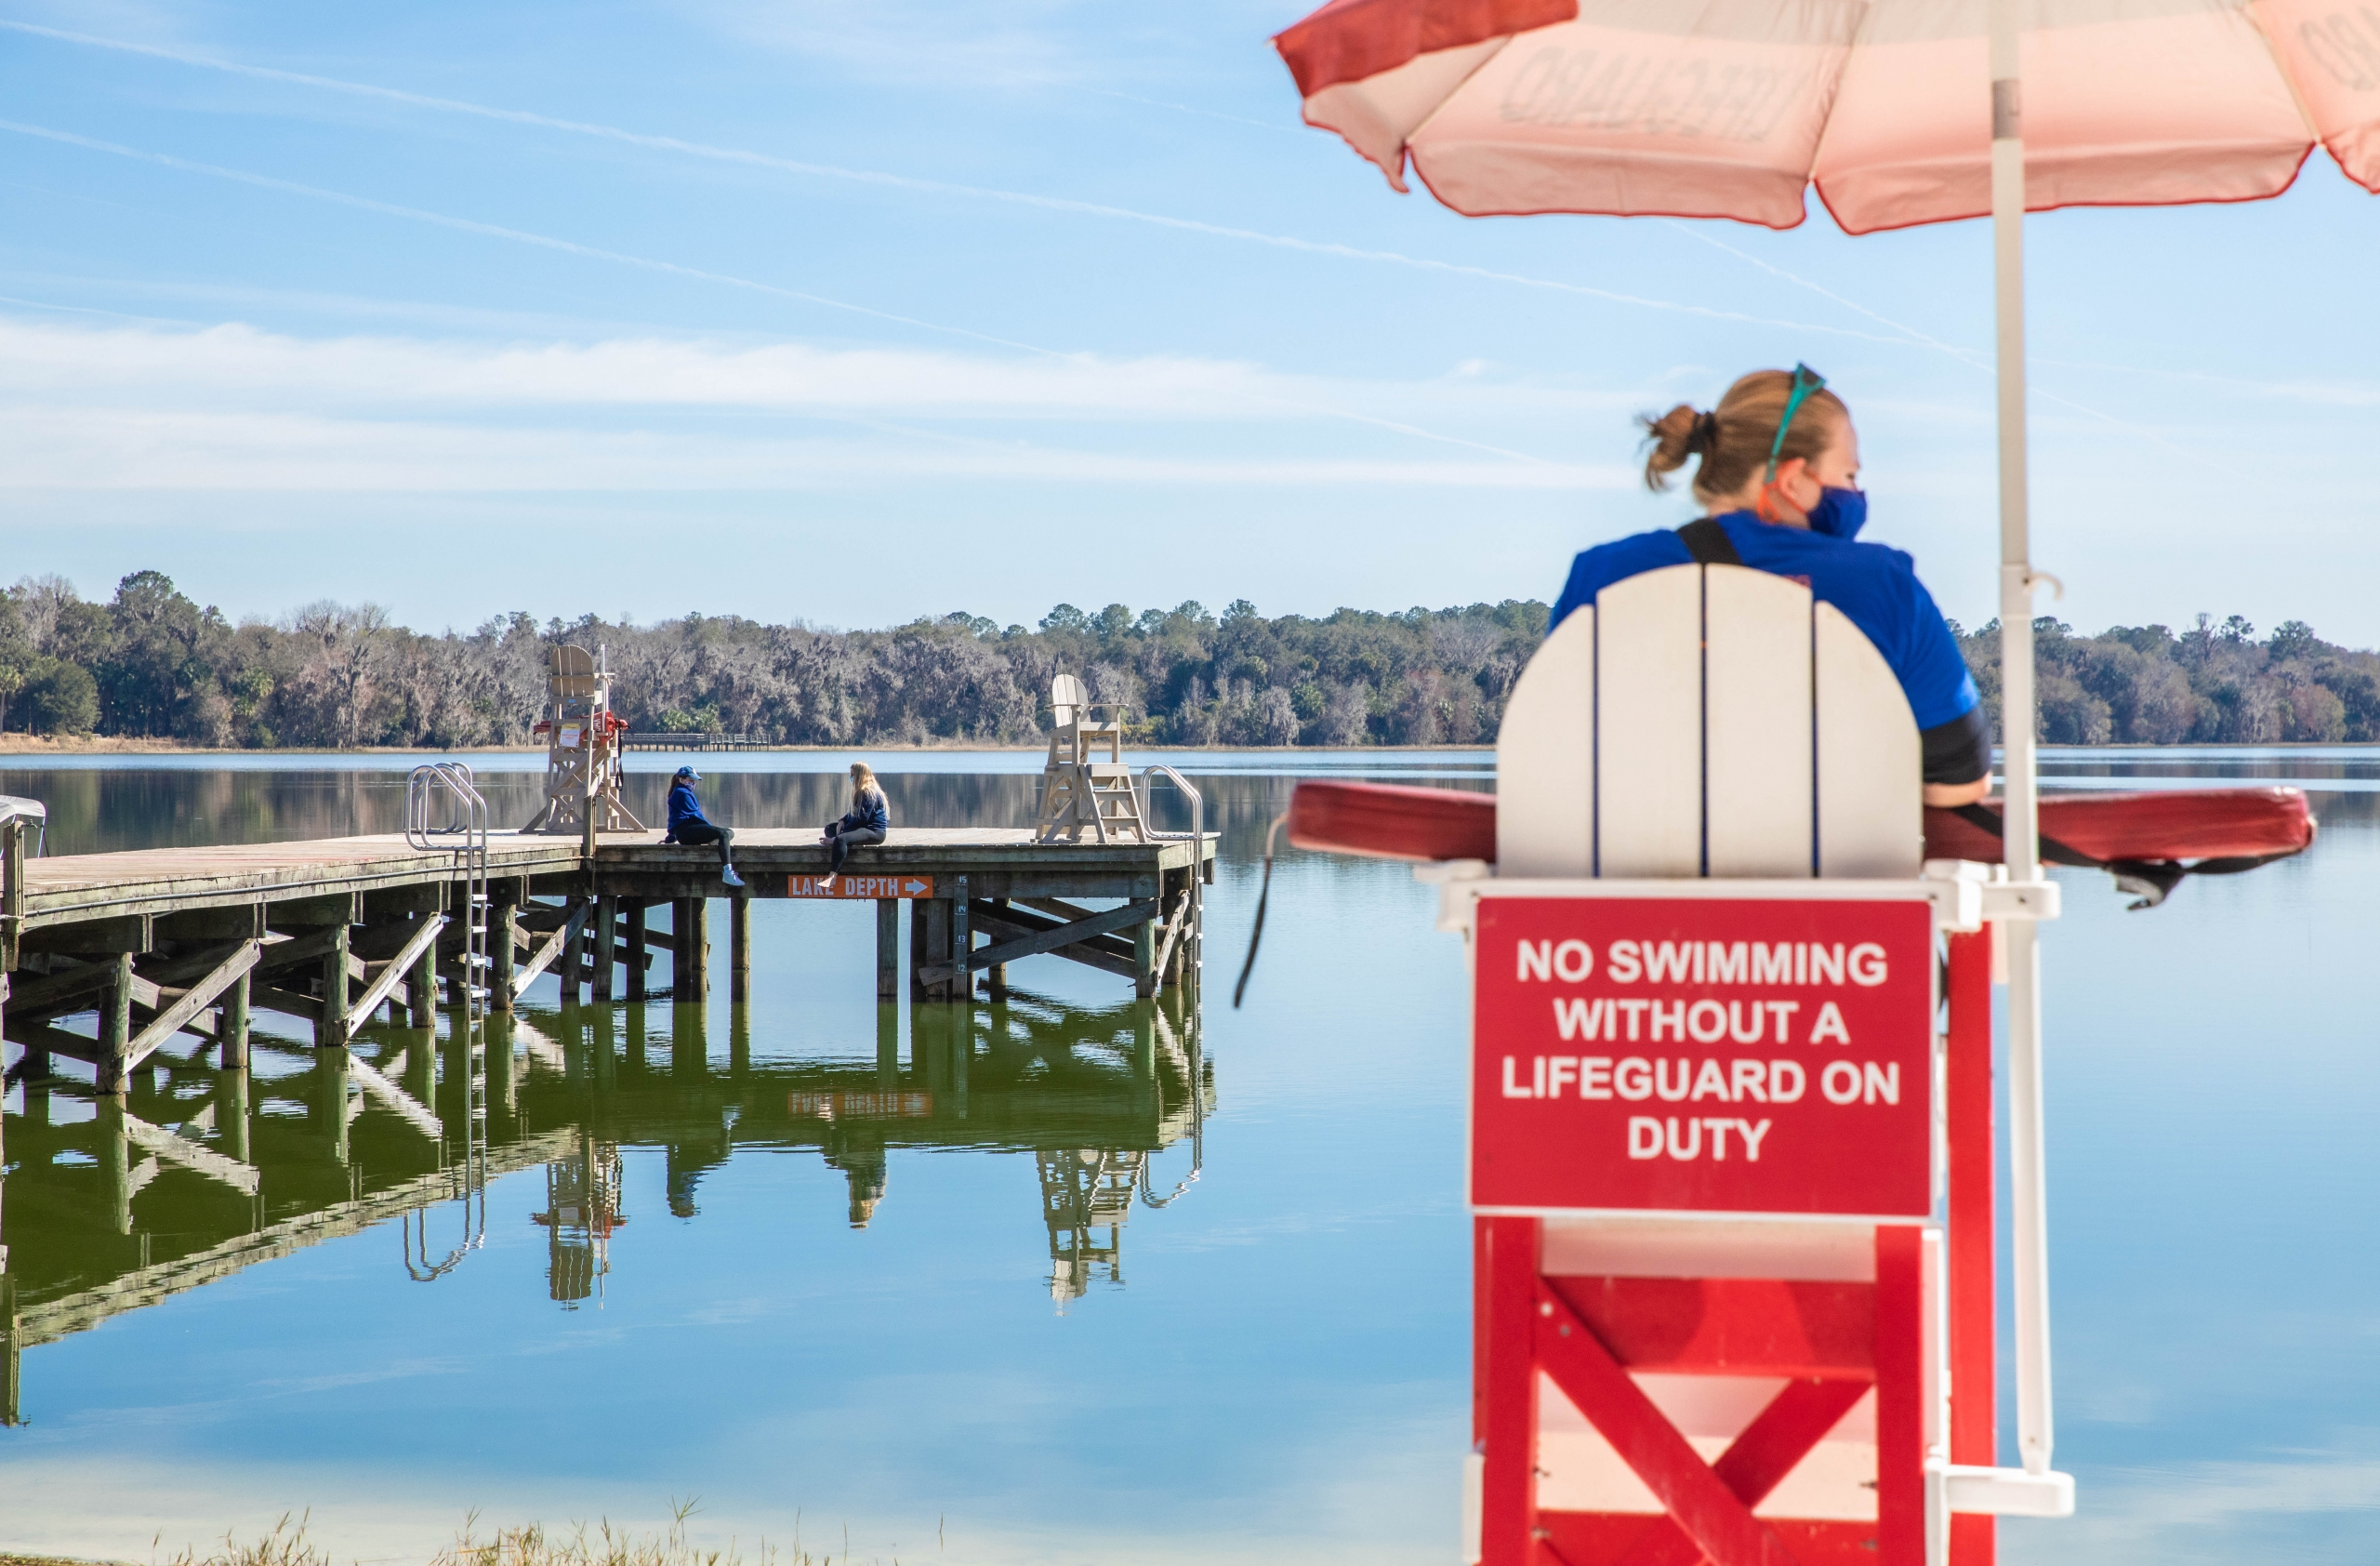 Lake Wauburg Swimming Area